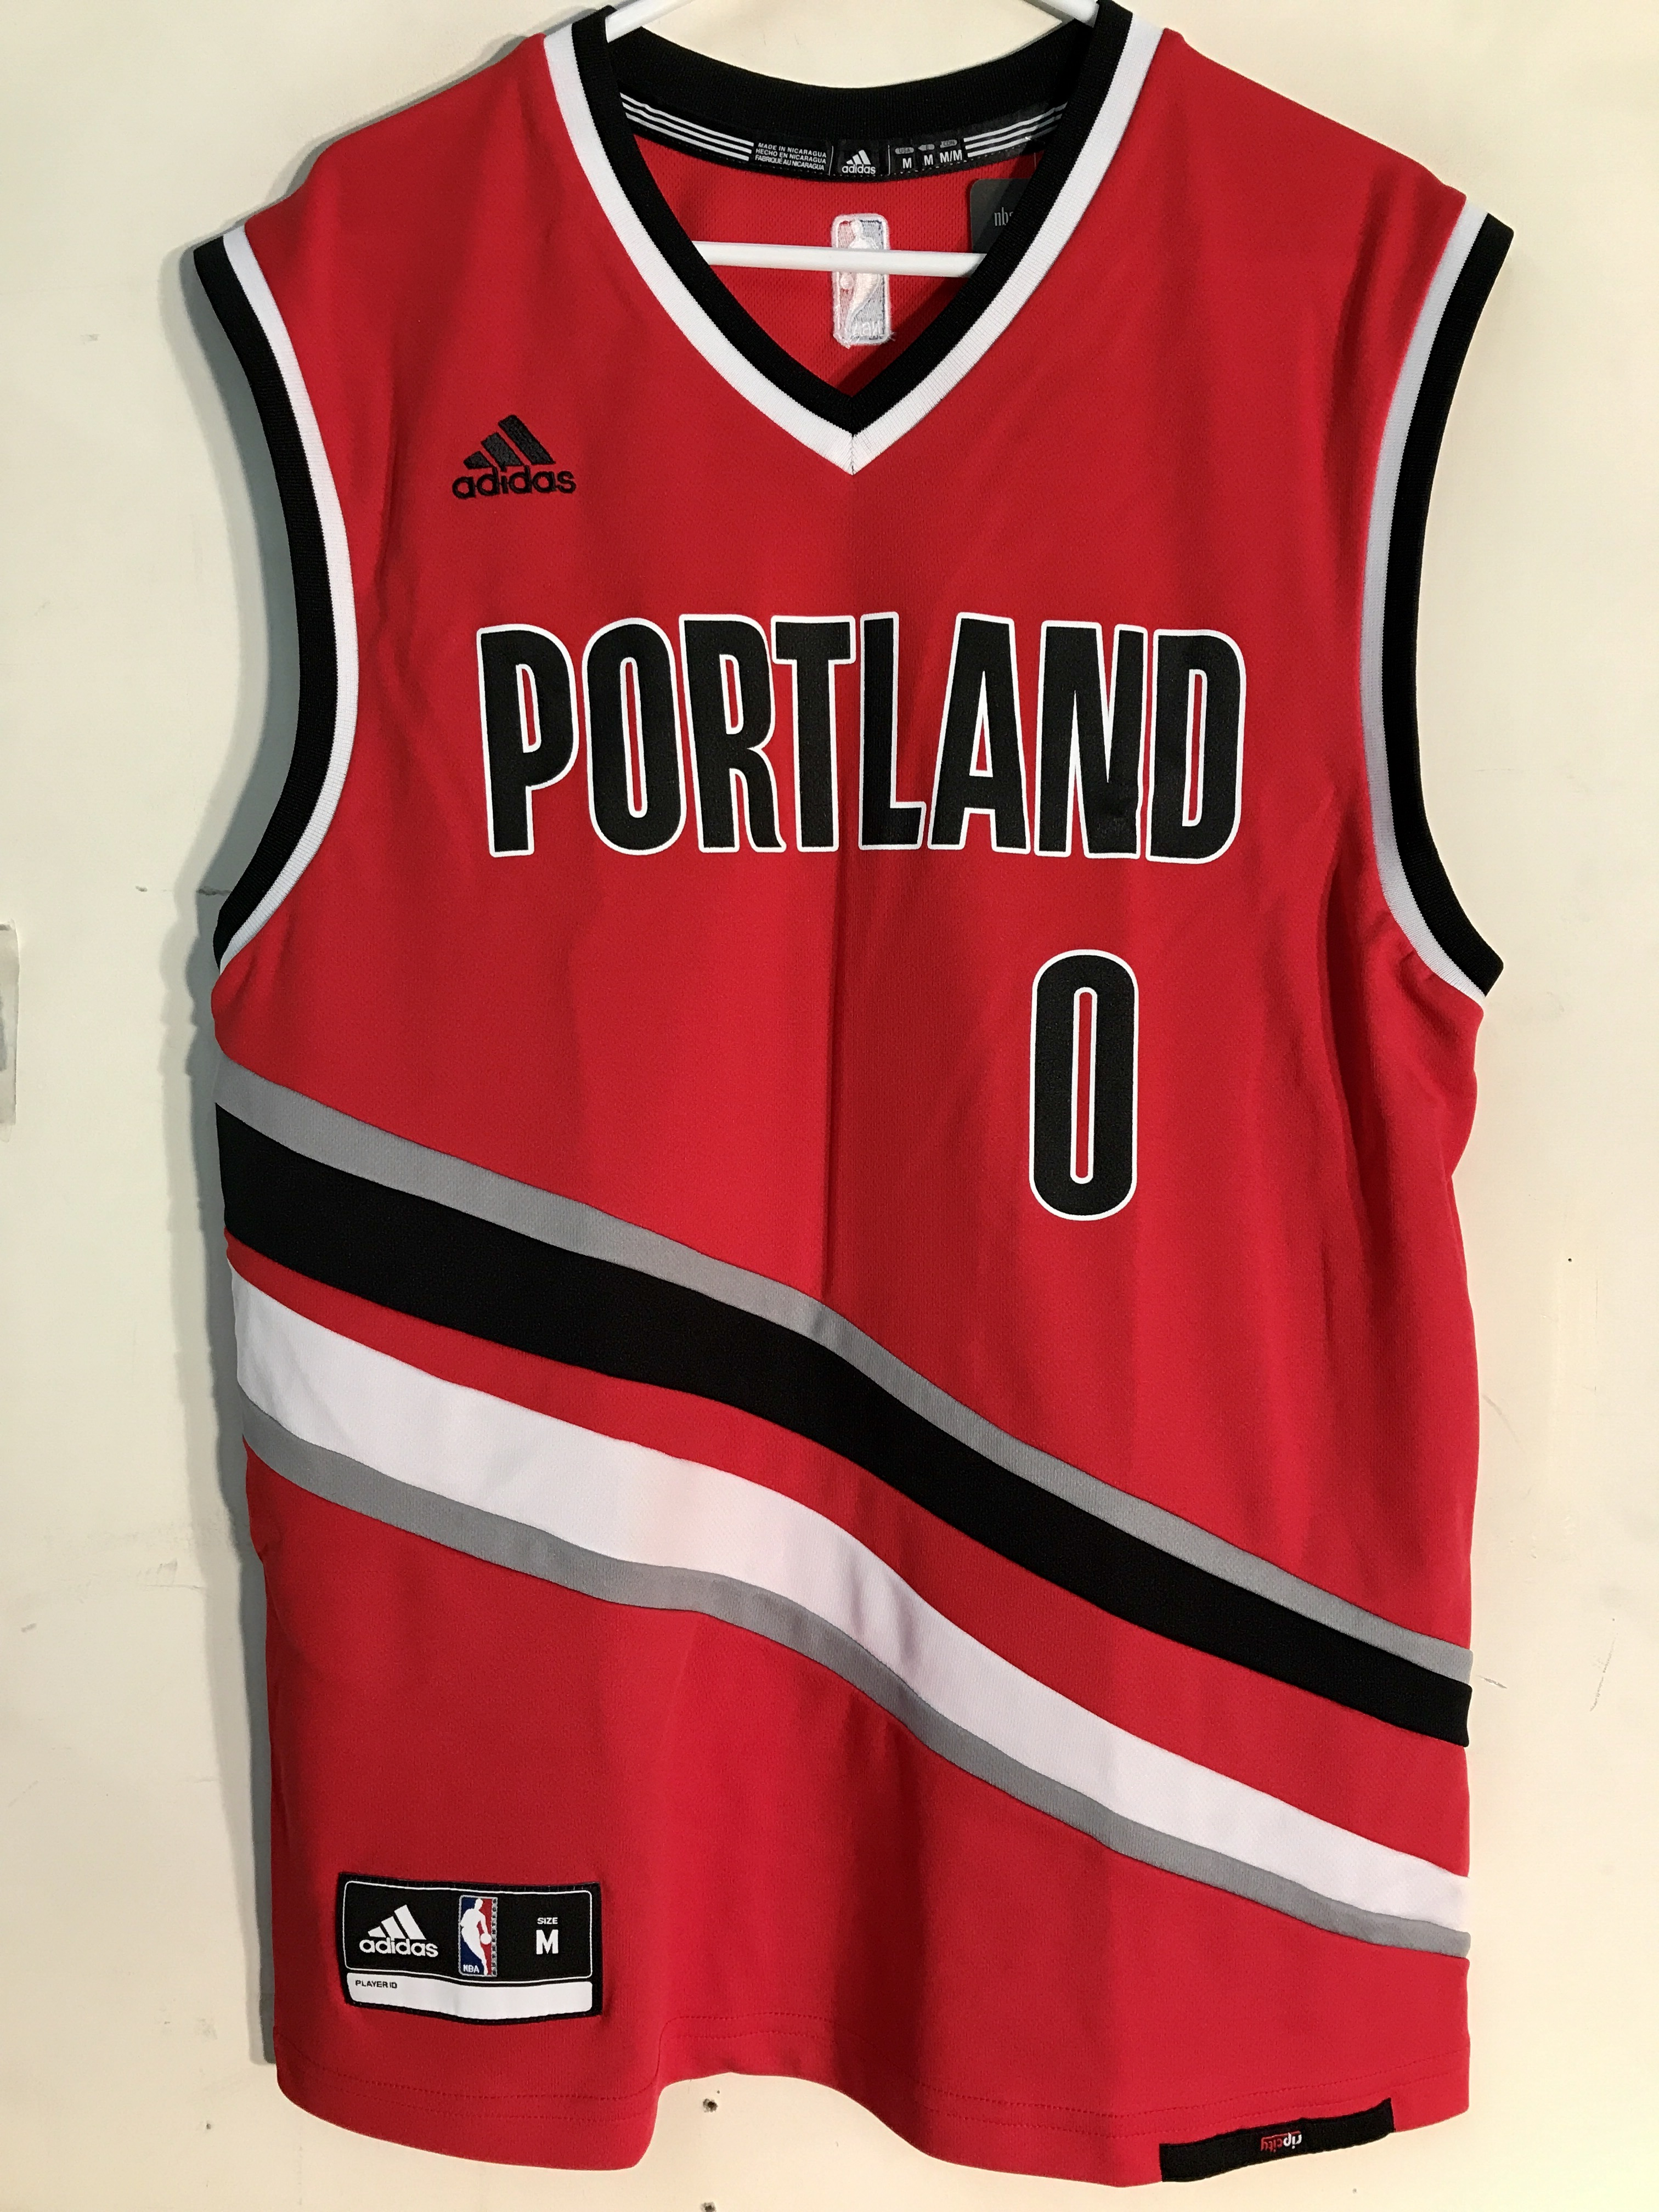 sneakers for cheap aab1e d73a4 Details about Adidas NBA Jersey Portland Trailblazers Damian Lillard Red  Alt sz XL